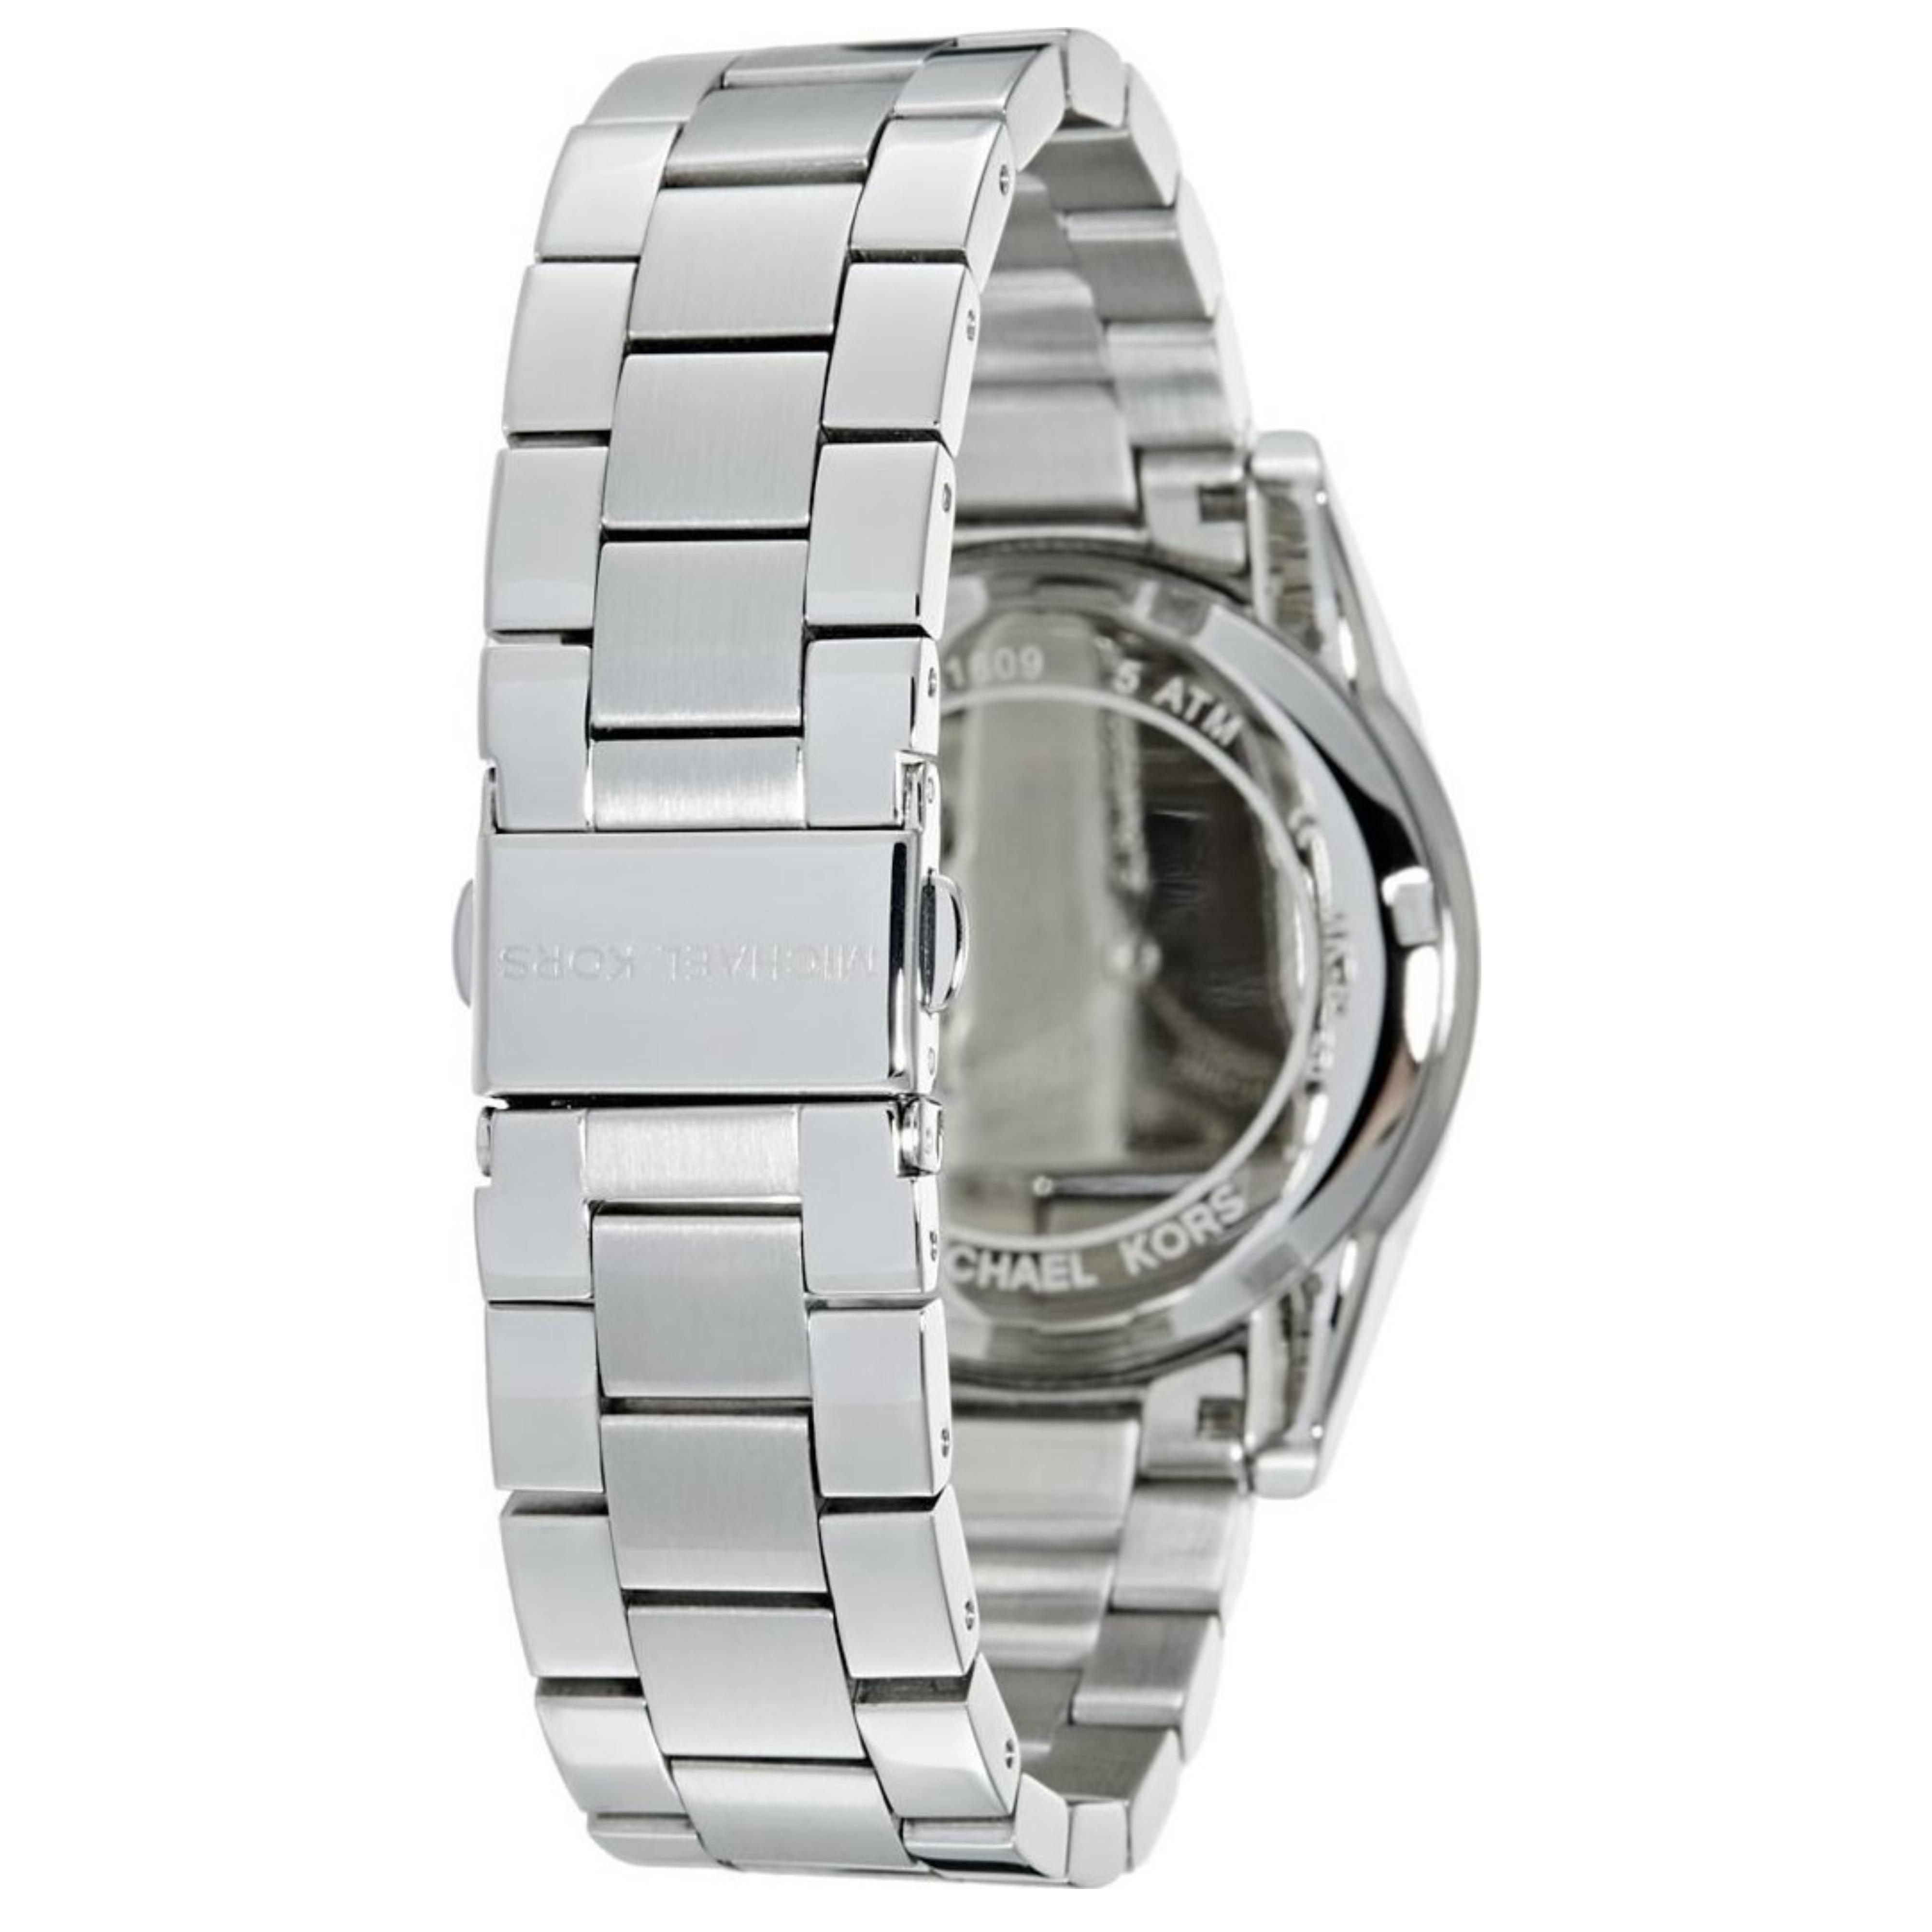 c36b0c0bd9ed Sentinel Michael Kors Ritz Ladies Watch MK6428│Stainless Steel Chronograph  Round Dial